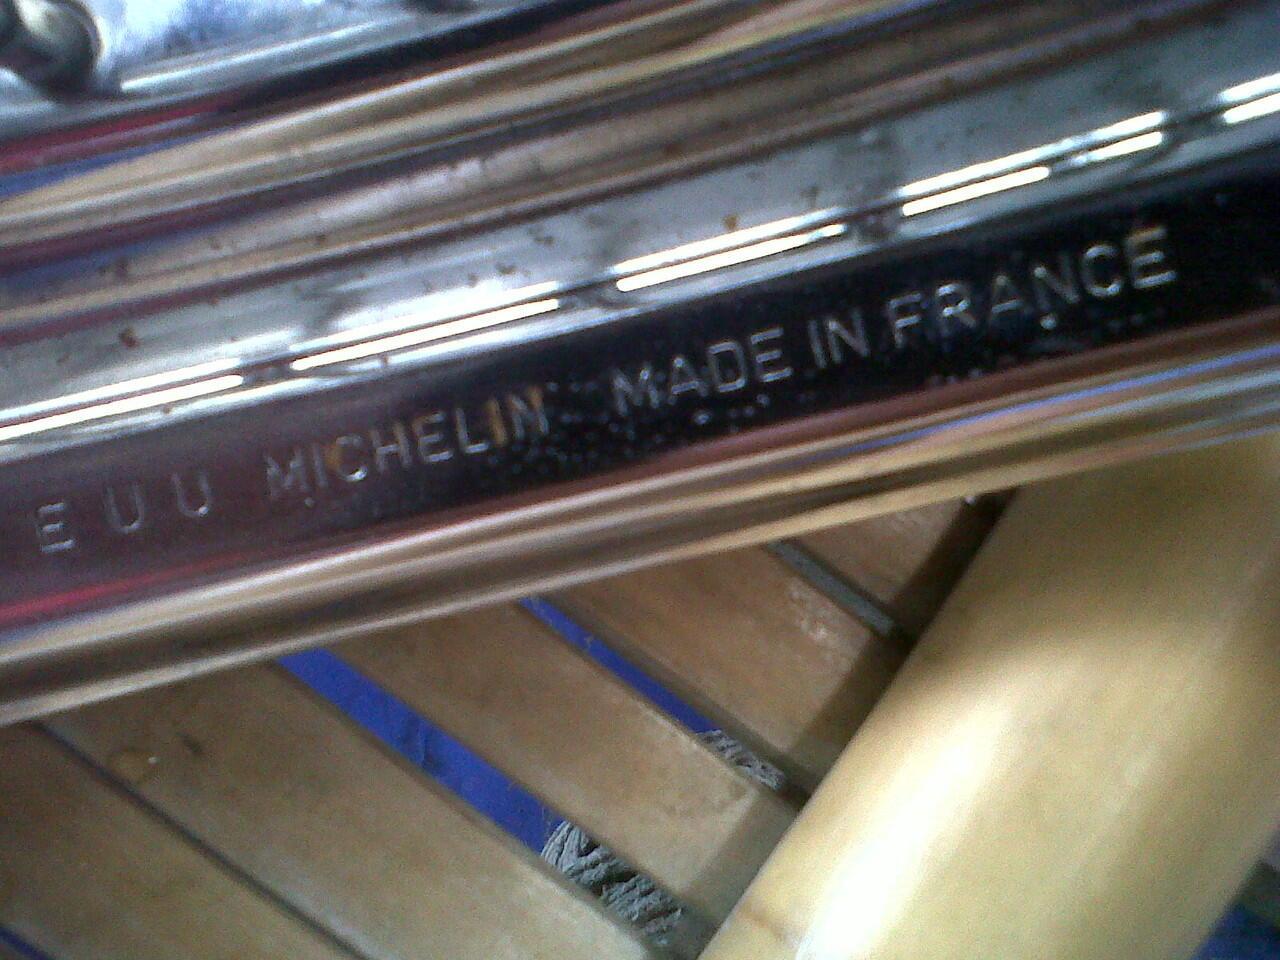 velg lebar merk MICHELIN made in FRANCE tromol yamaha mio bandung